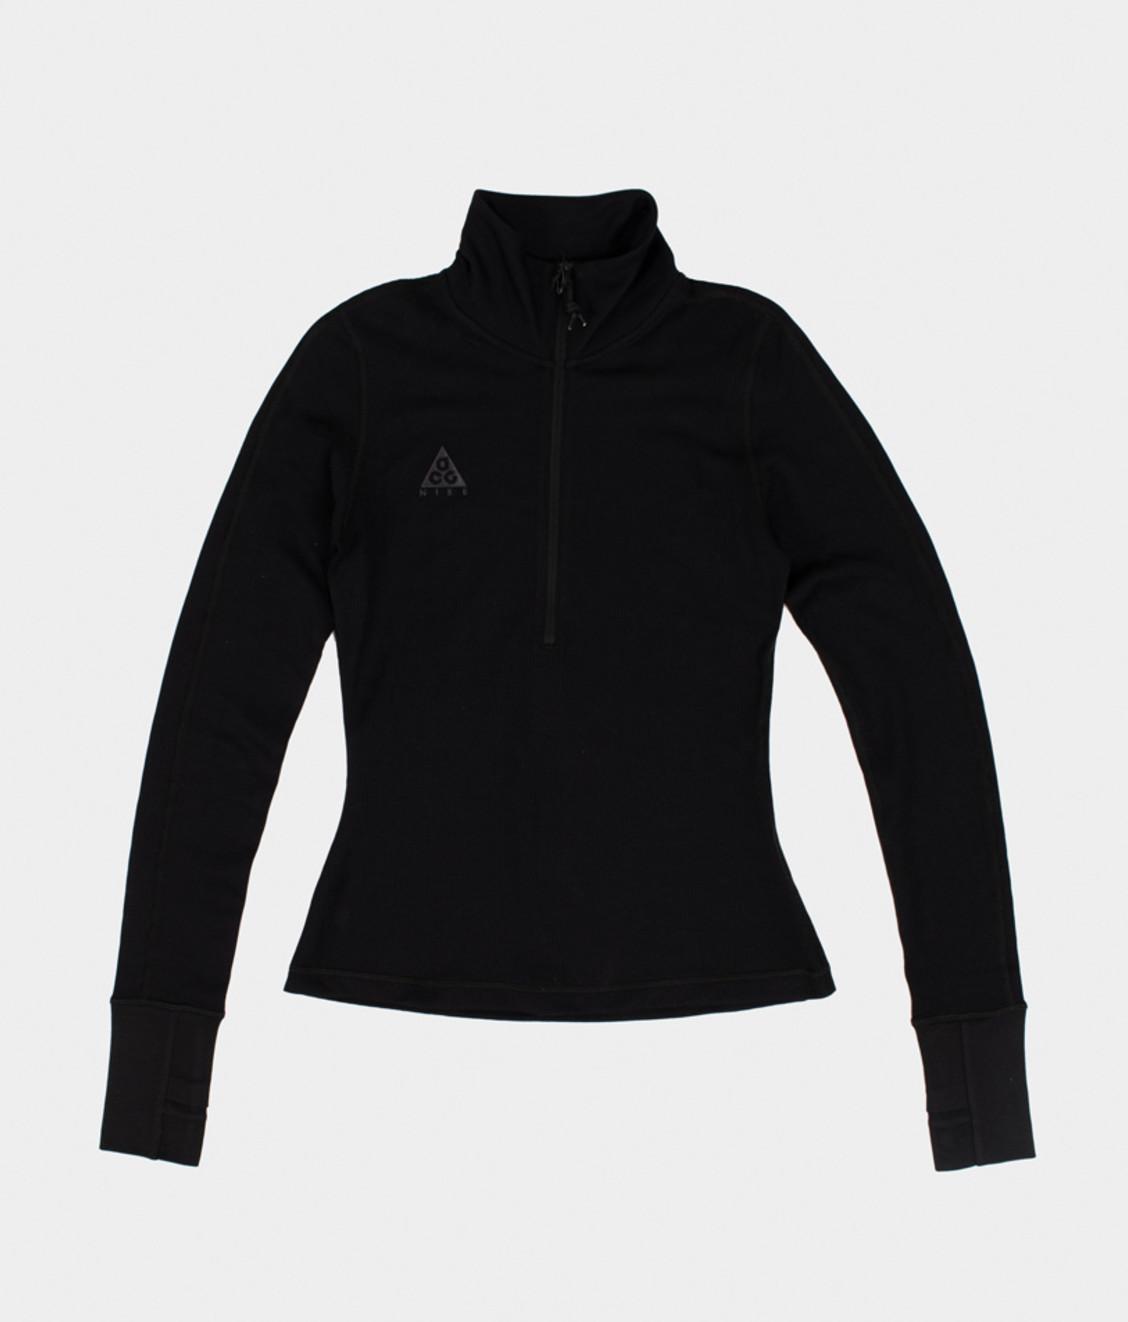 Nike Nike ACG Thermal Long Sleeve Black